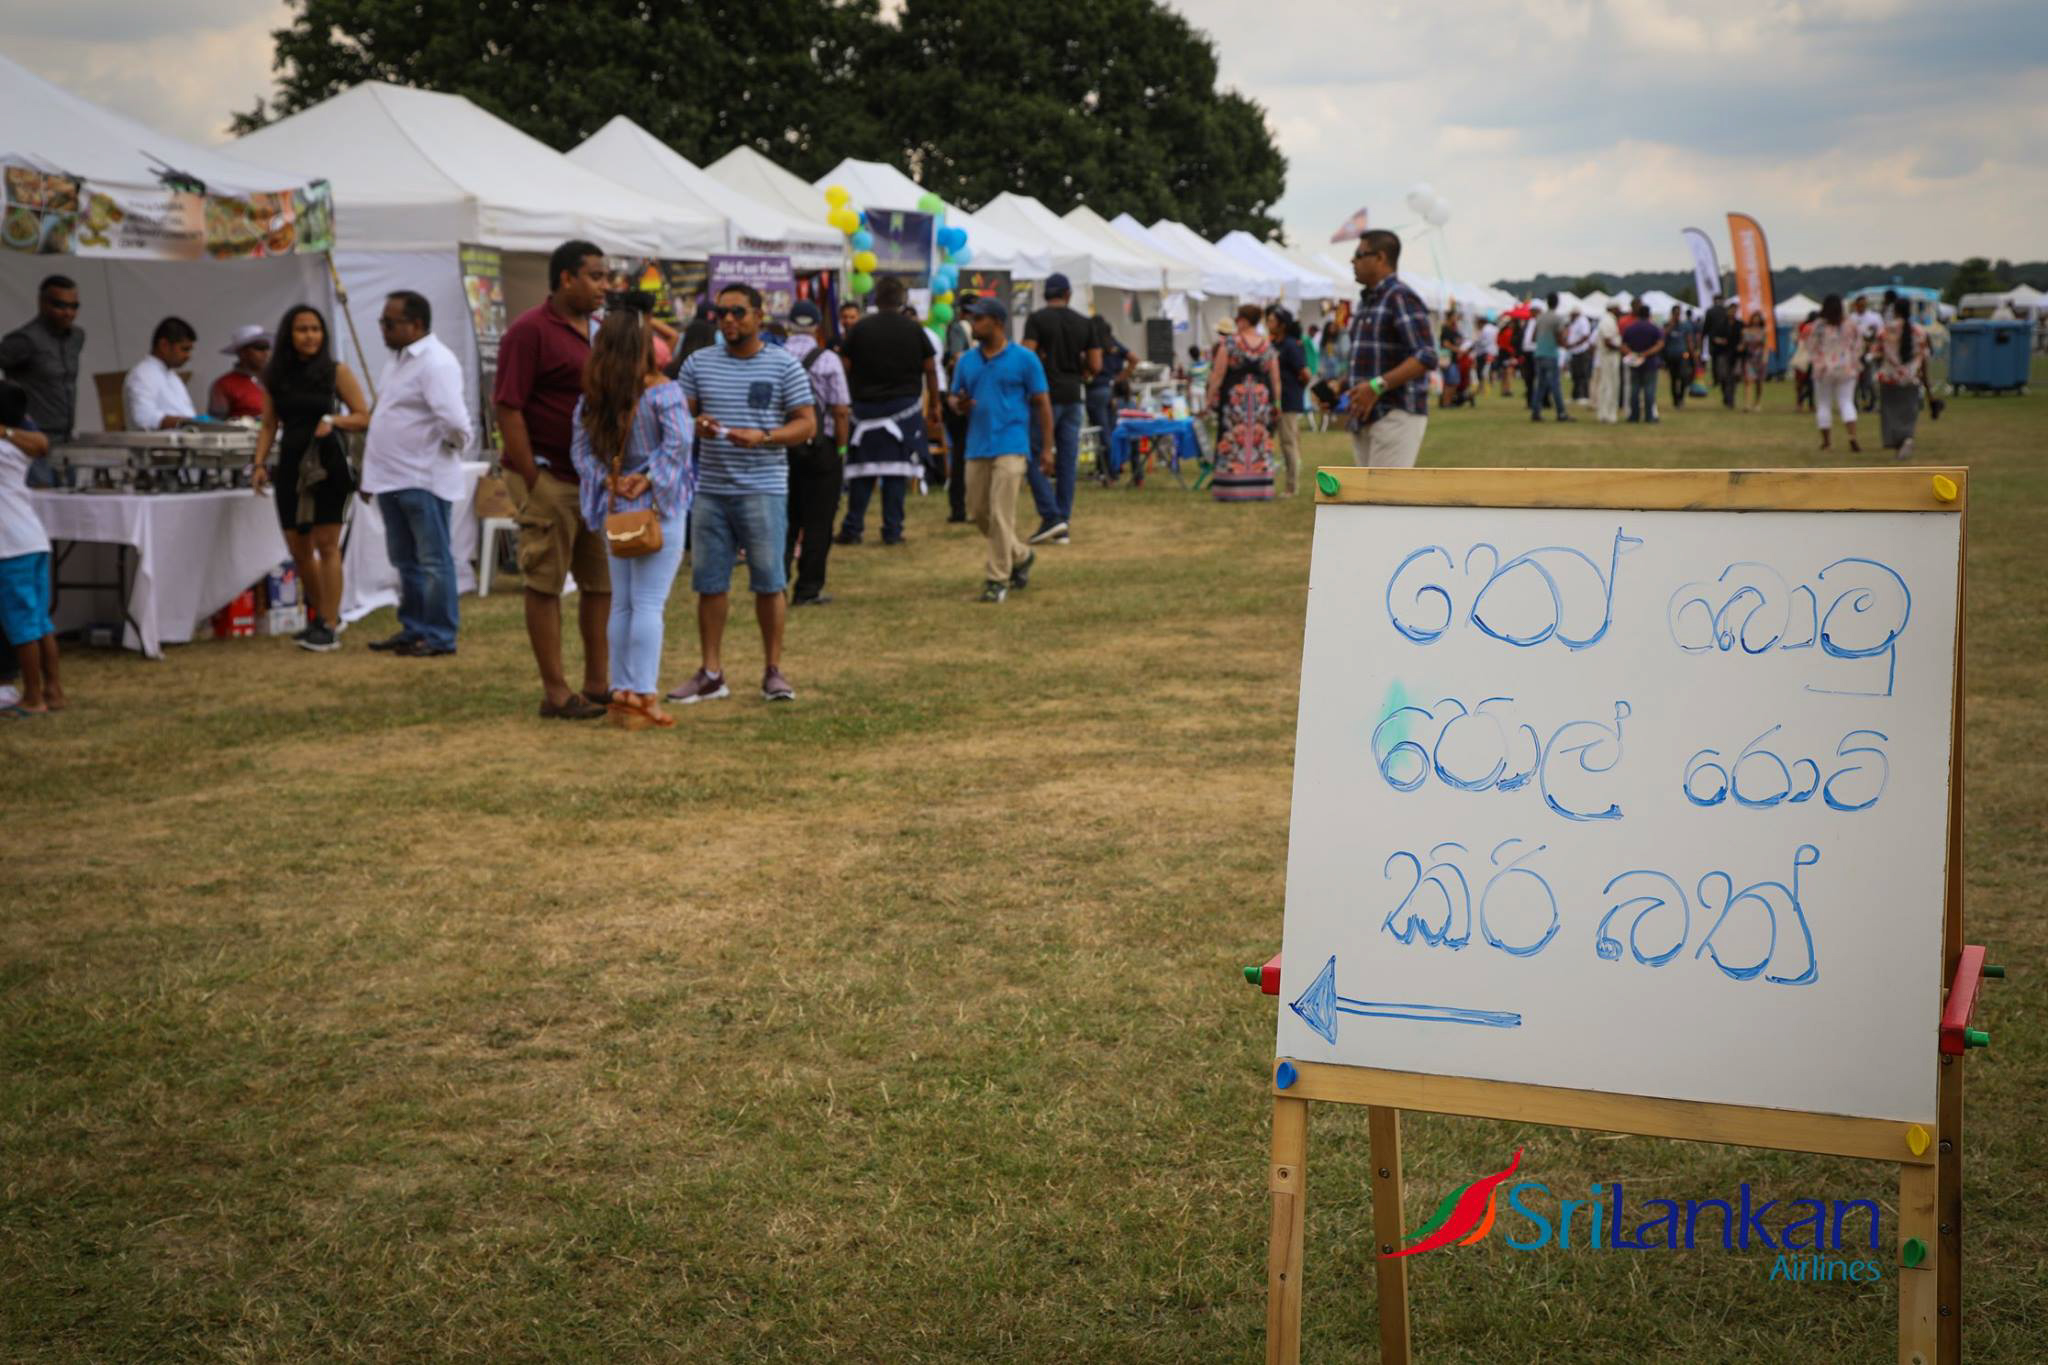 Sri-Lankan-airlines-cricket-festival-london-2017-natalia-smith--photography-2.jpg